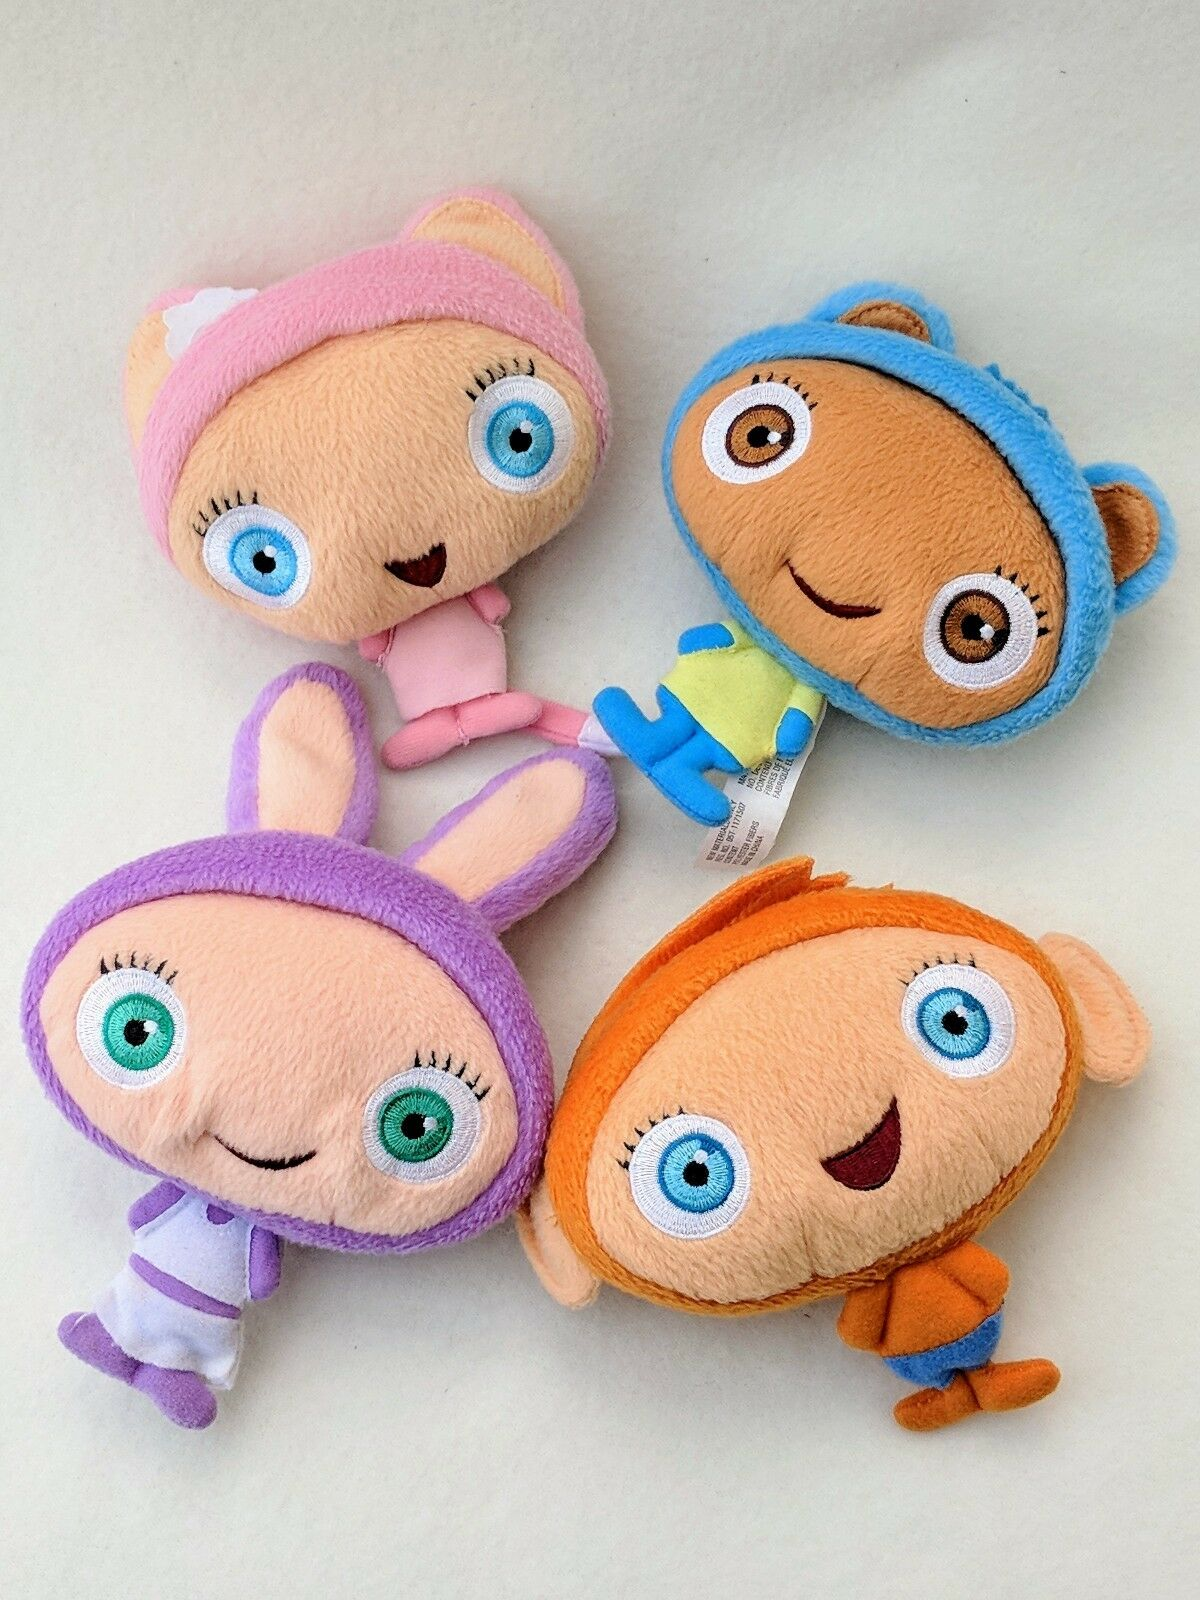 Waybuloo soft toy set nok nok nok tok - jojo de li lau lau cuddly teddy bundle menge d02abc